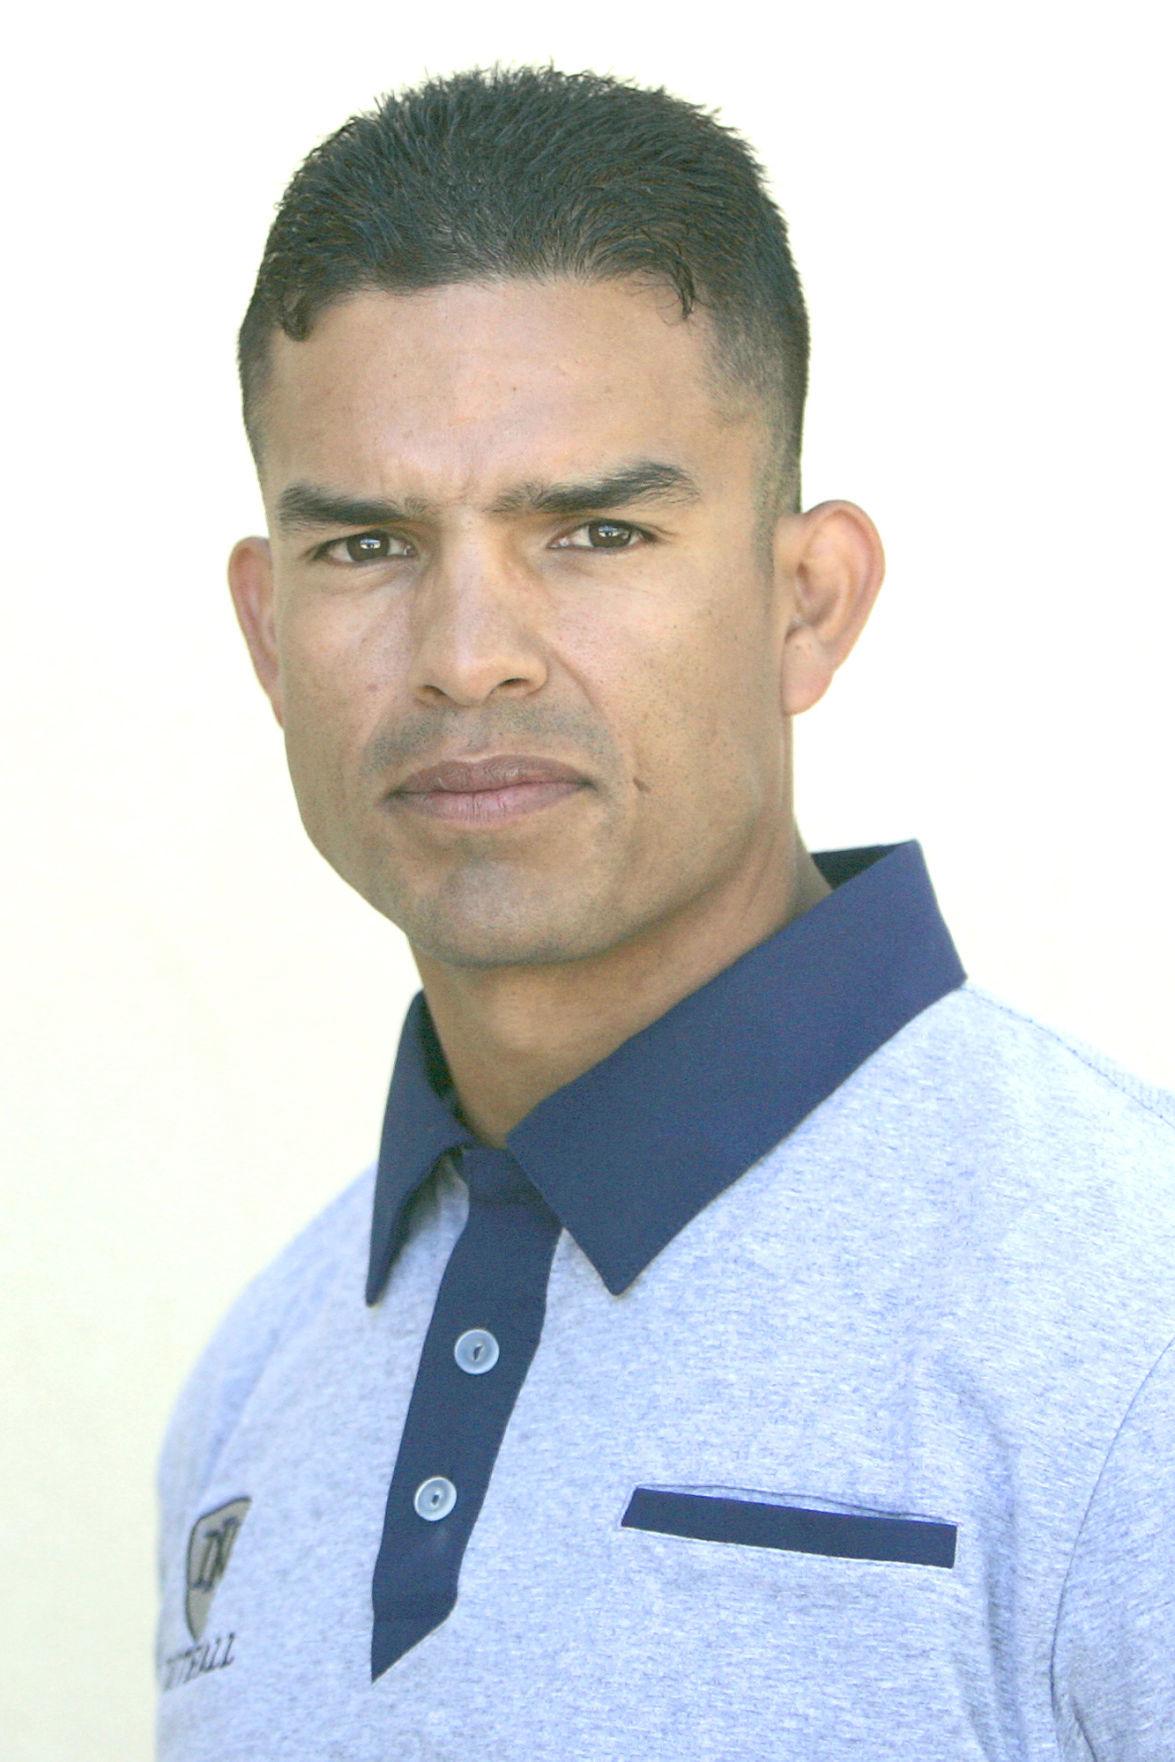 Napa High School head football coach Jesus Martinez